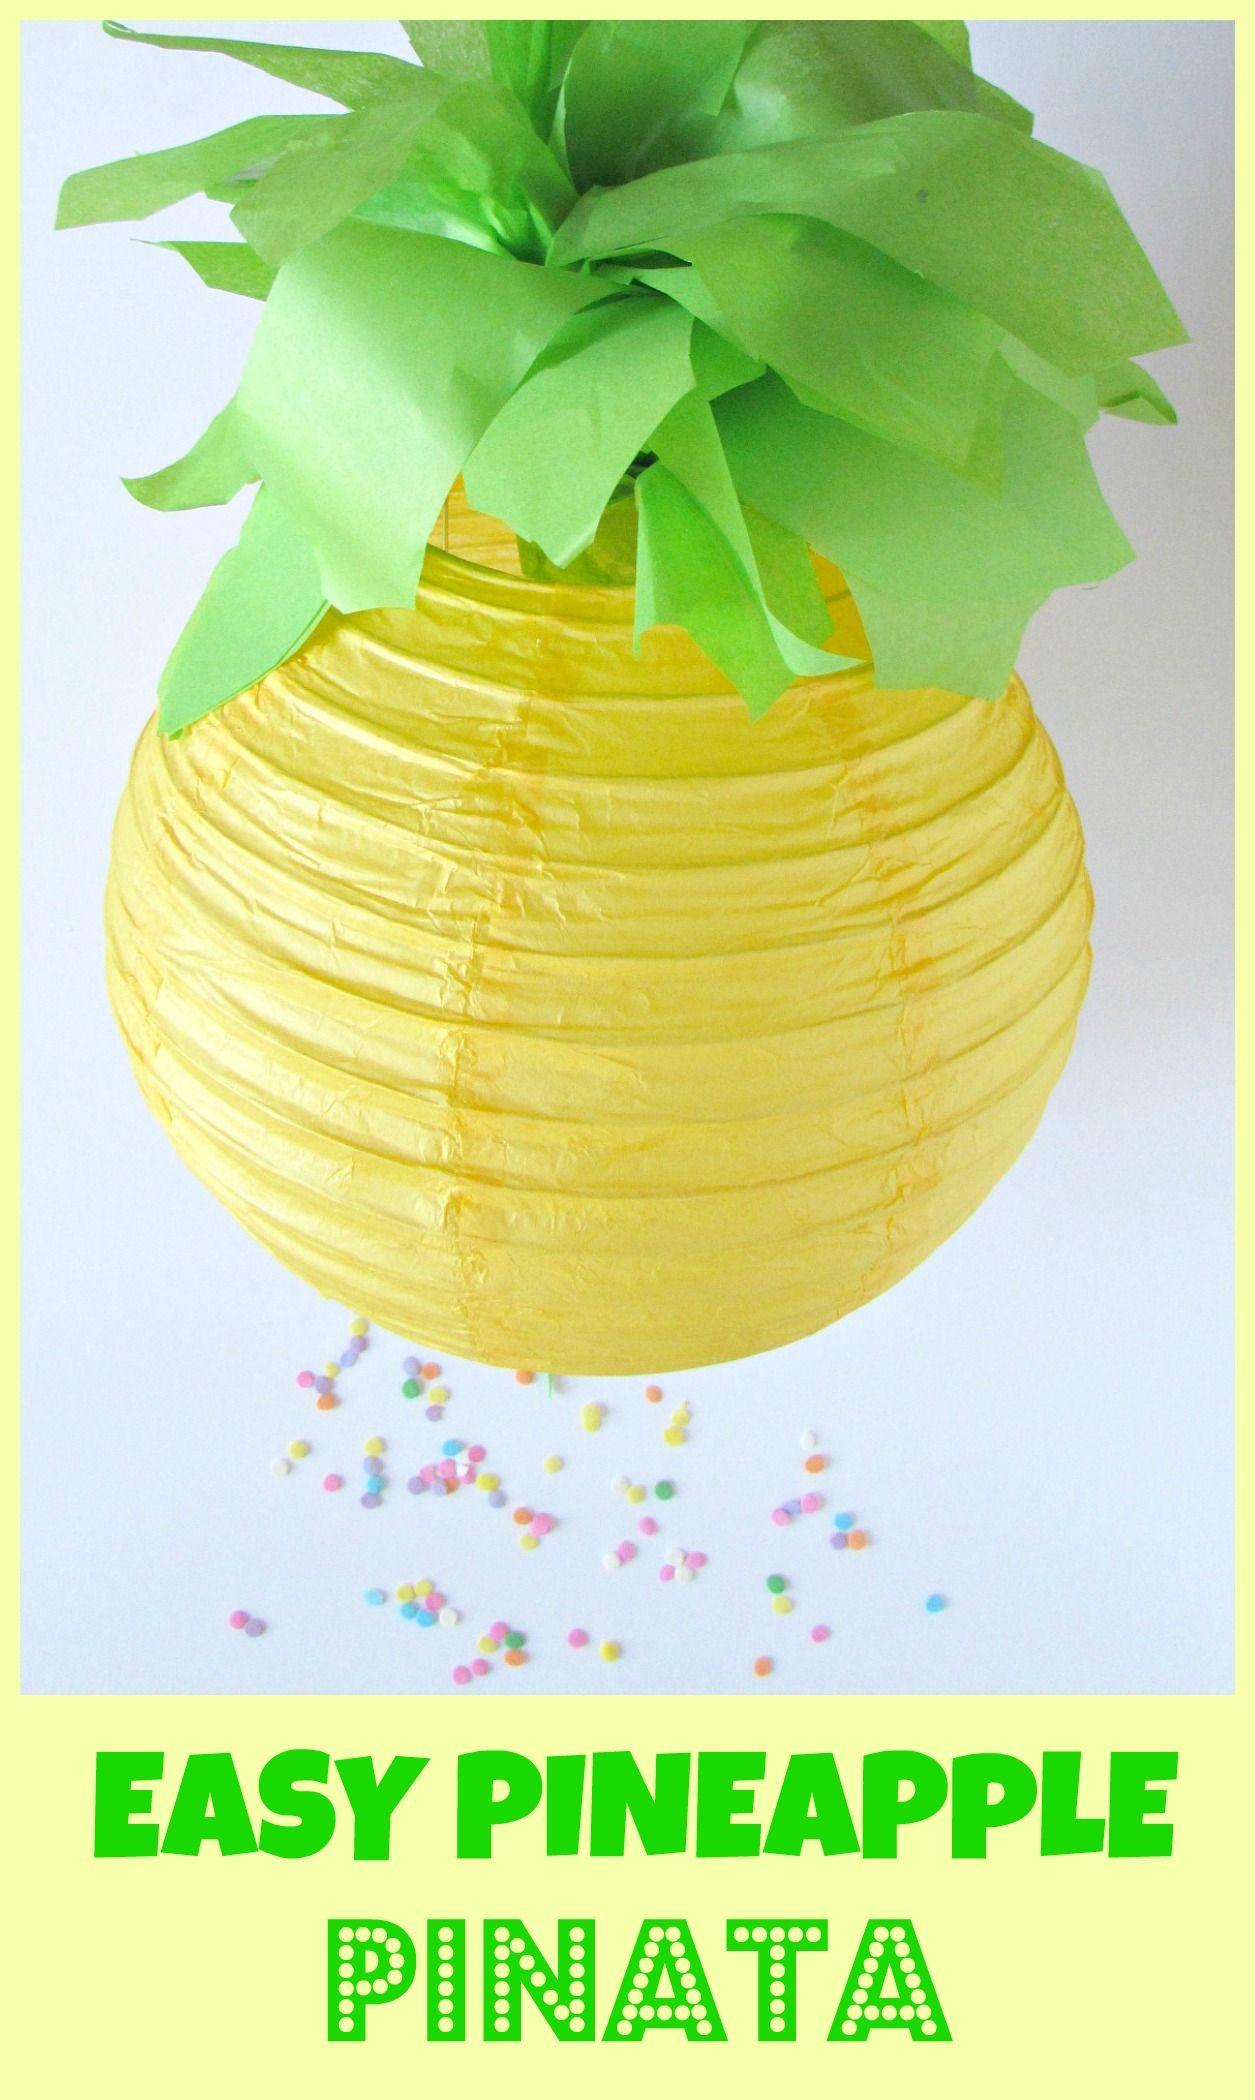 Easy Pineapple Pinata | Pinterest | Easy, Luau and Luau party